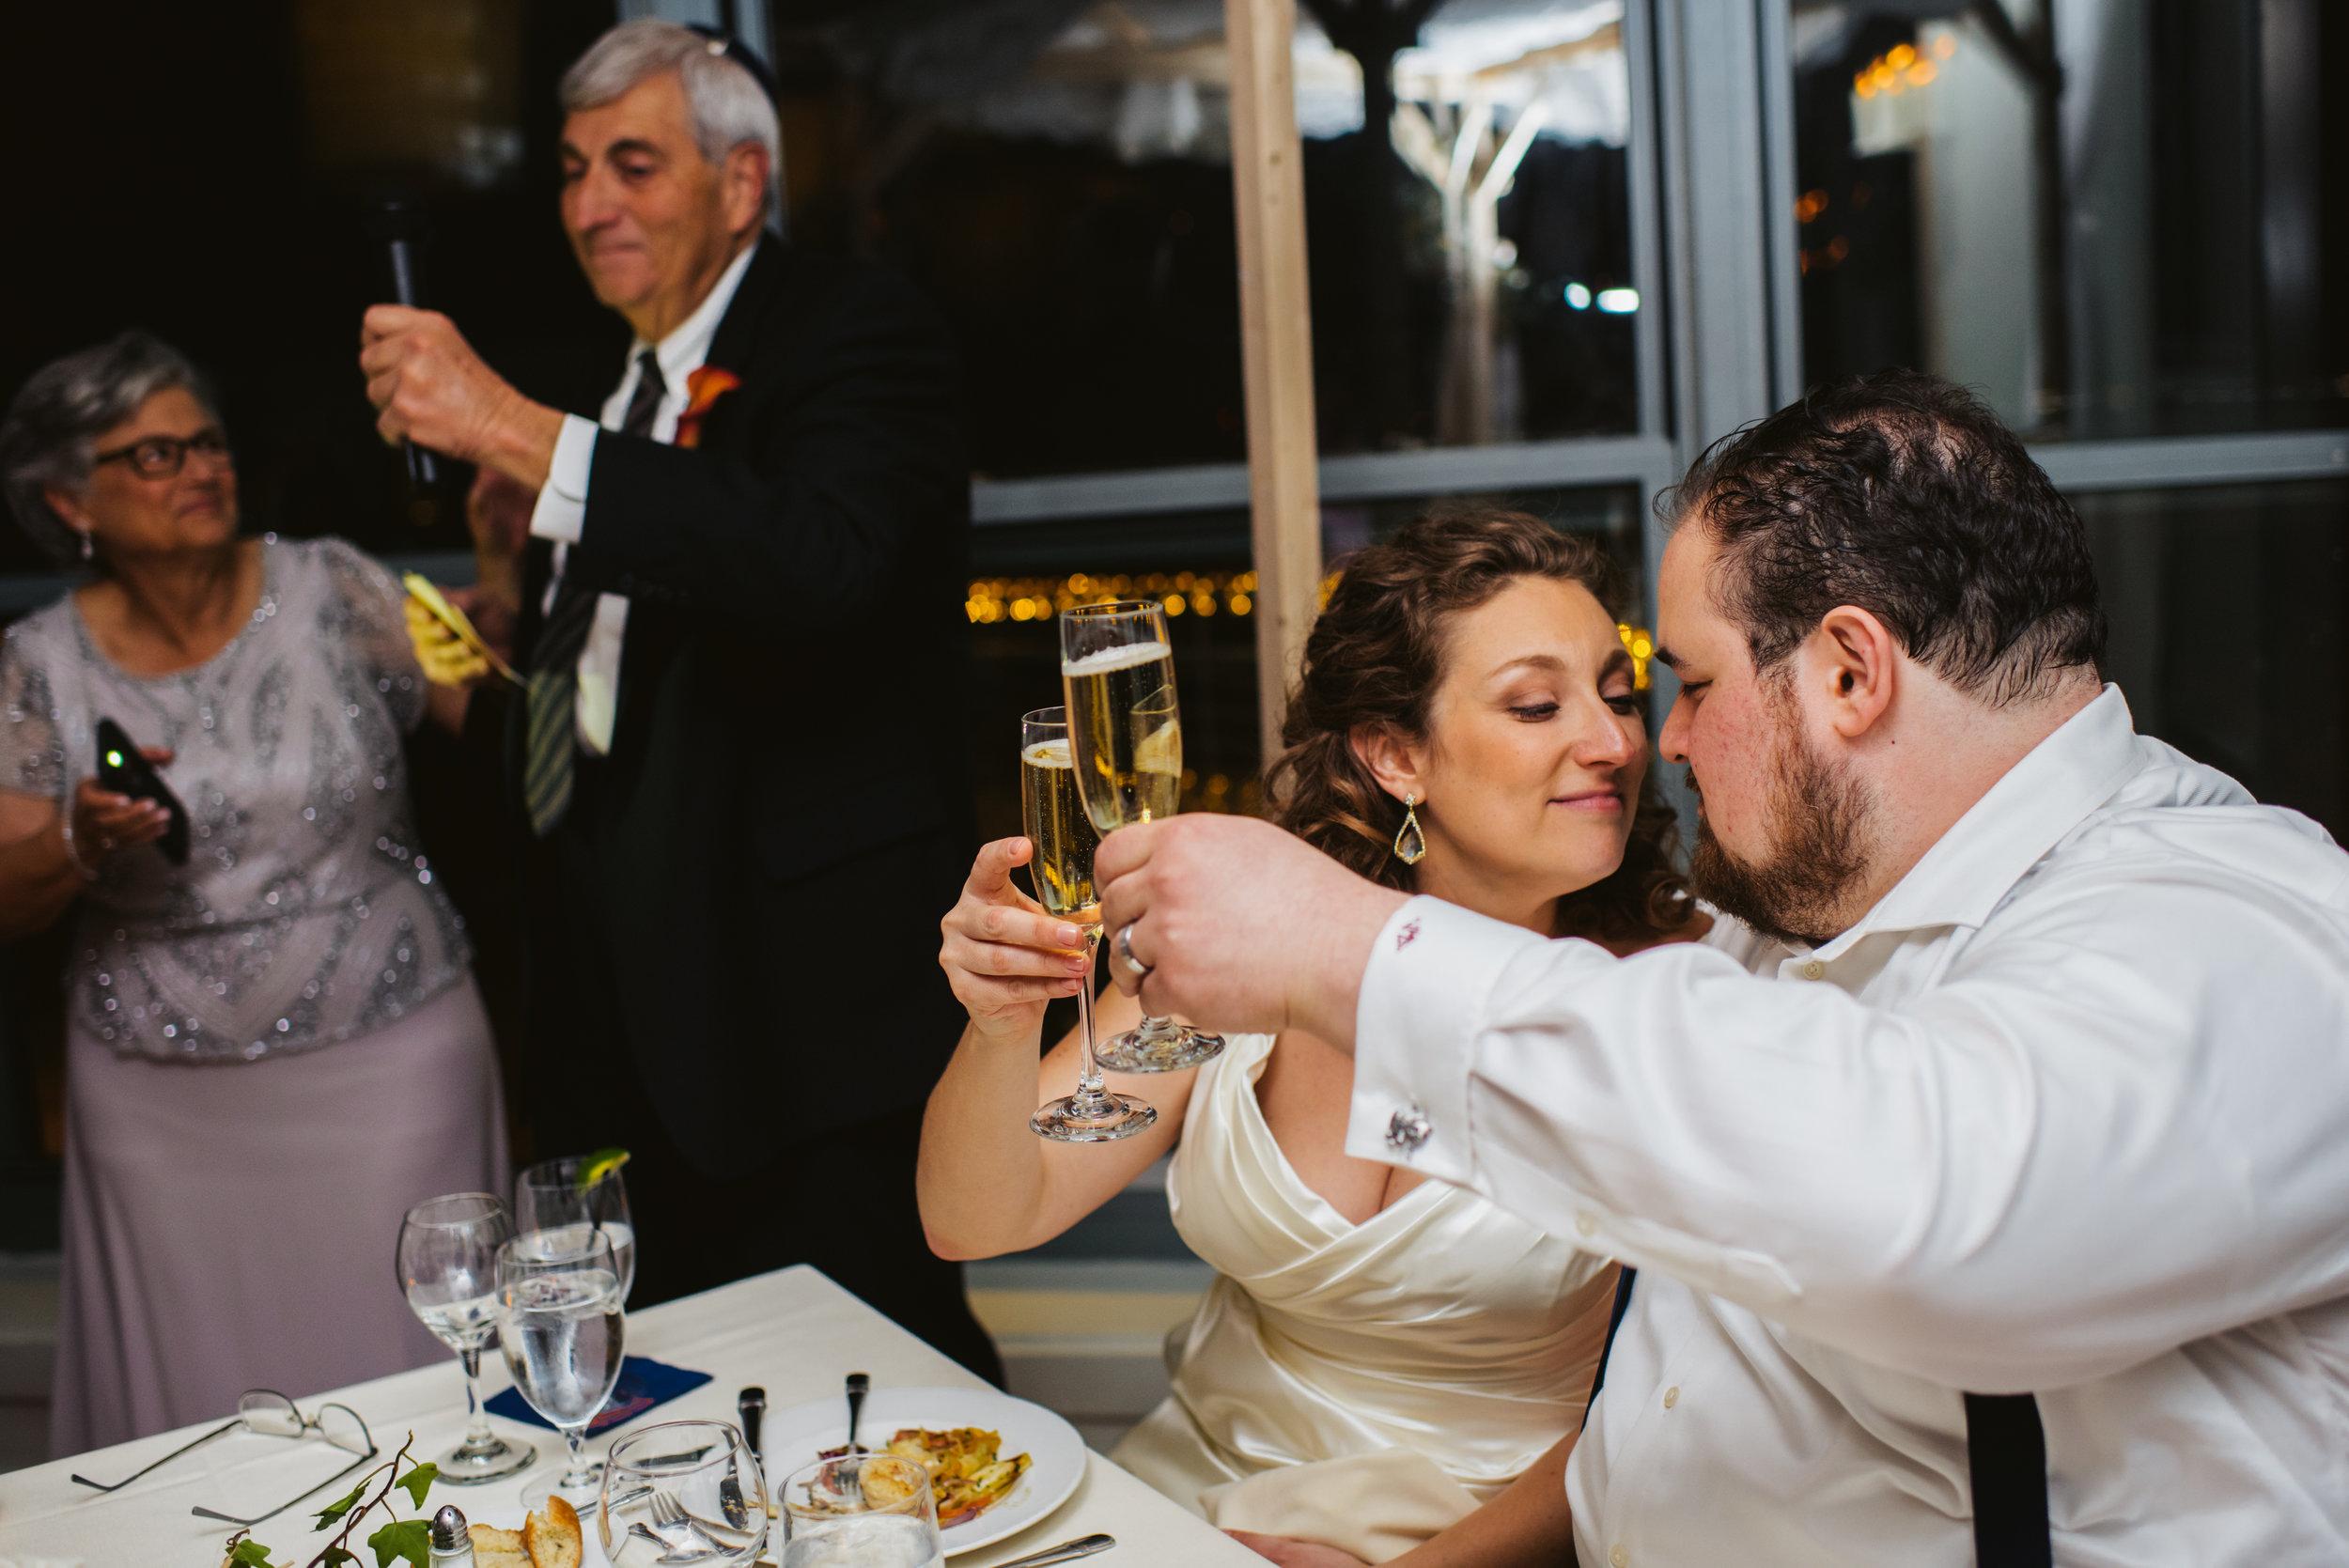 LIZA & JON - BATTERY PARK WEDDING - NYC INTIMATE WEDDING PHOTOGRAPHER - CHI-CHI AGBIM-755.jpg